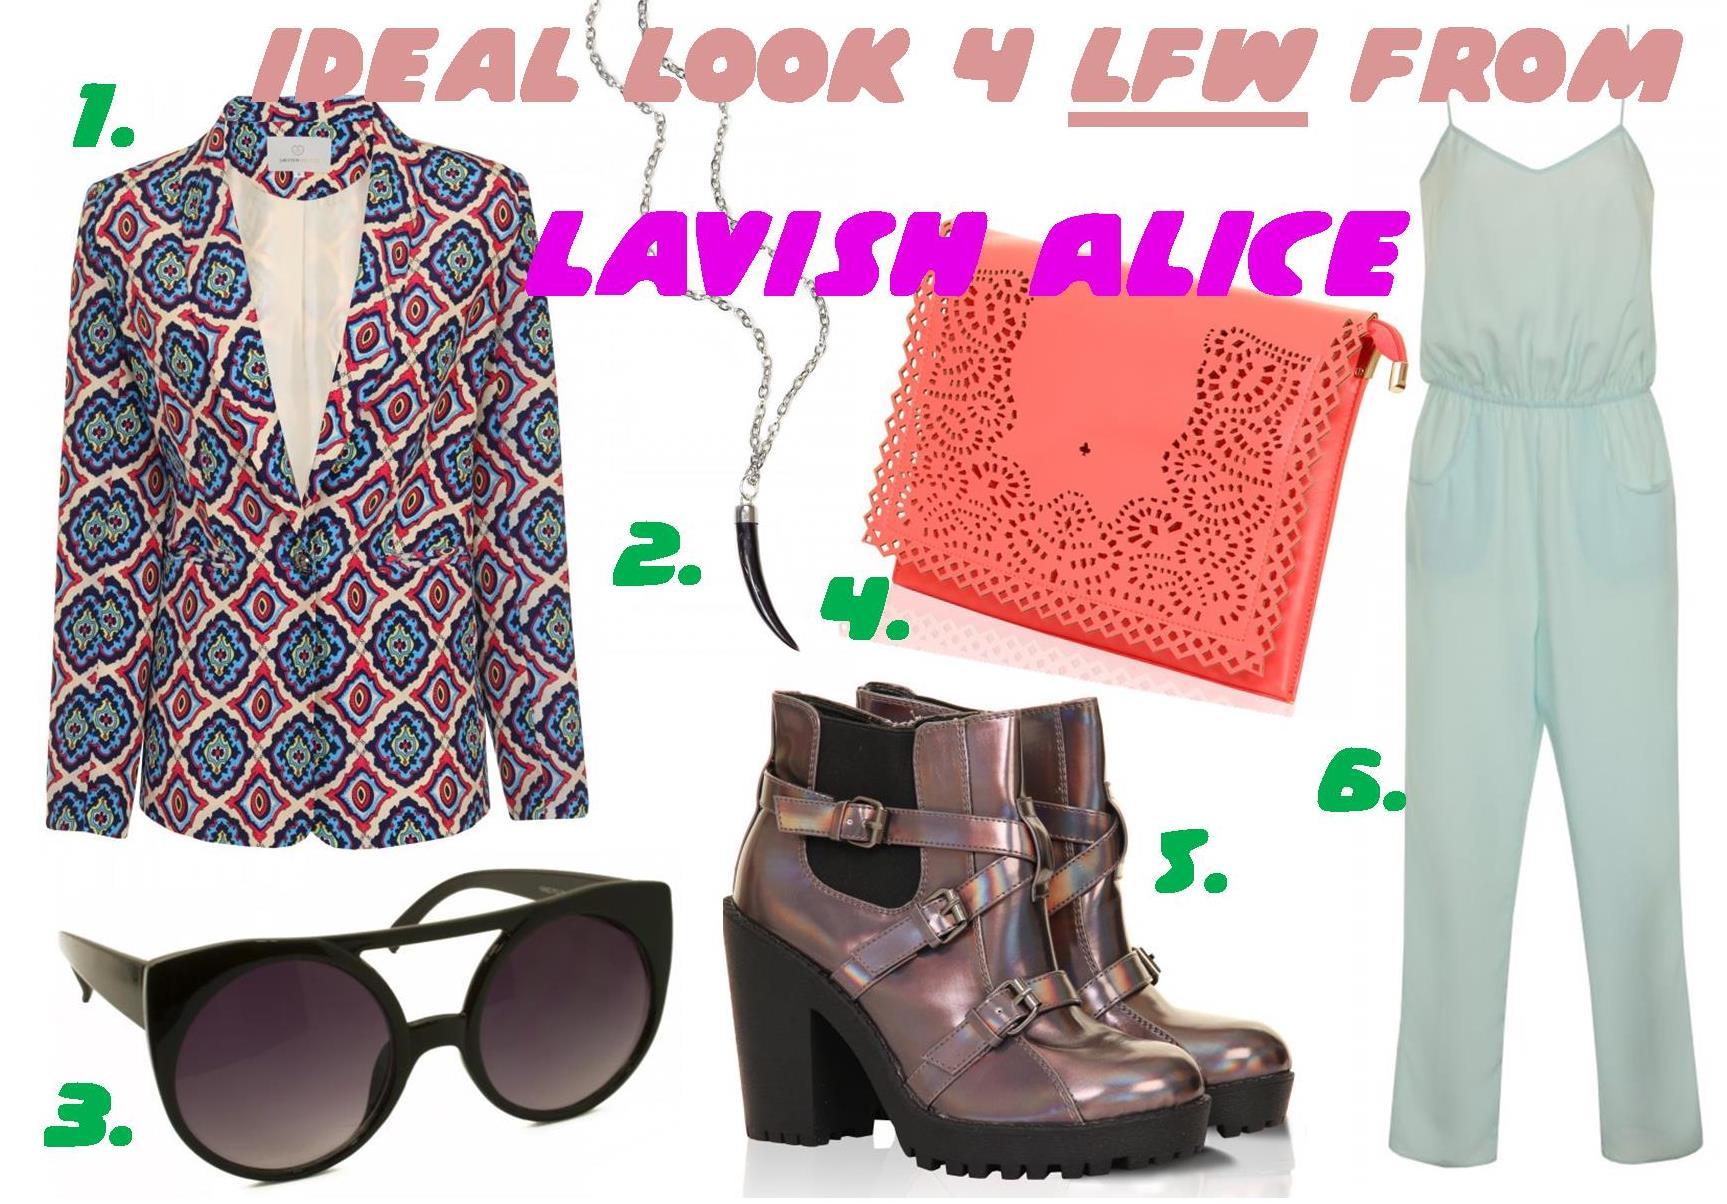 My ideal LFW look from Lavish Alice